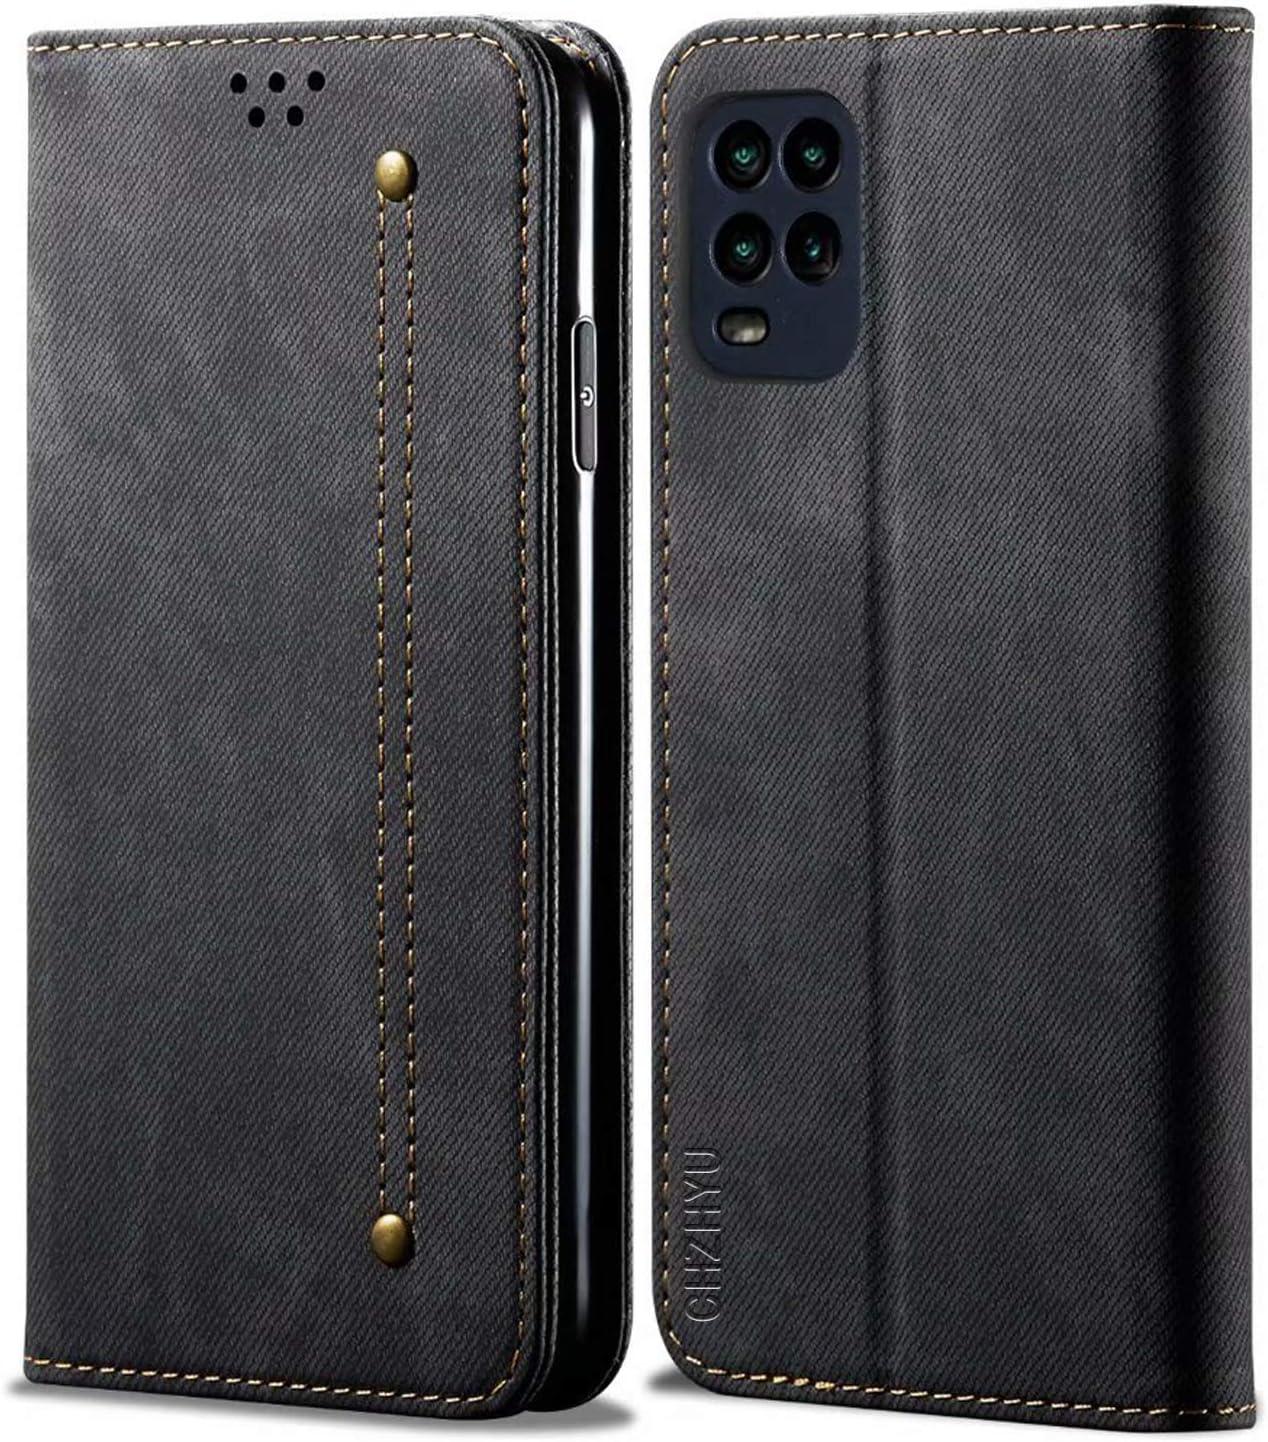 CHZHYU Funda para Xiaomi Mi 10 Lite 5G,Antigolpes Genuino Cuero Flip Folio Carcasa[Magnético][Soporte Plegable][Ranuras para Tarjetas] para Xiaomi Mi 10 Lite (Negro)